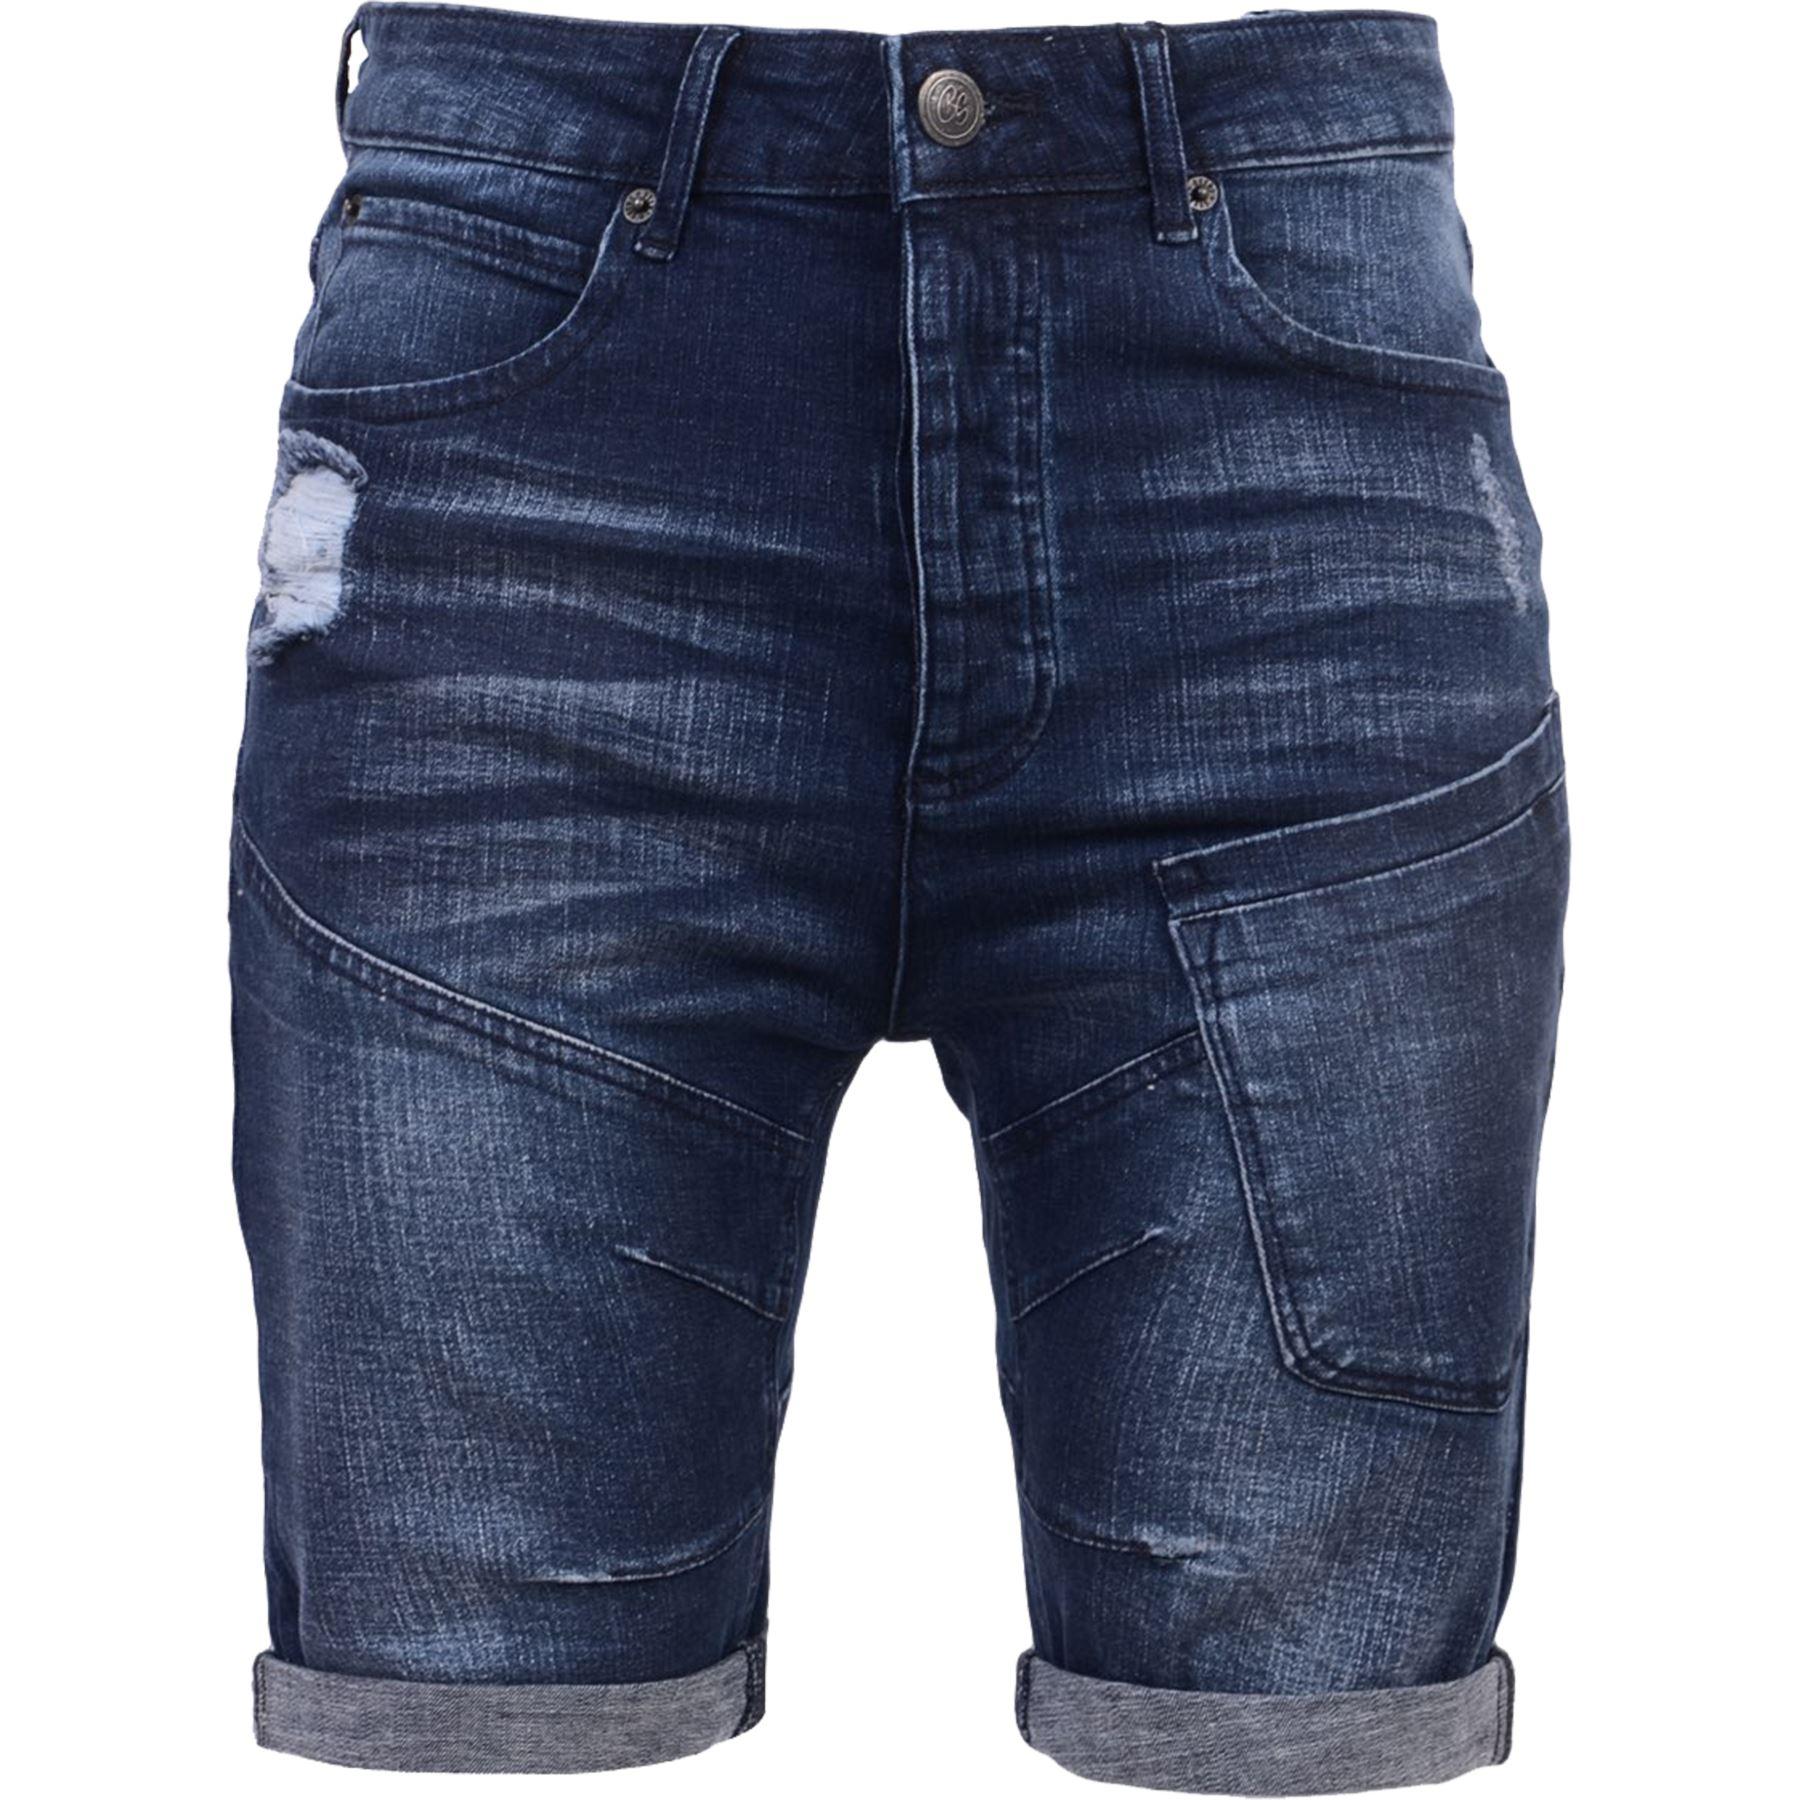 New-Mens-Crosshatch-Canvas-Cargo-Denim-Camo-Shorts-Chino-2019-Styles-30-42-034 thumbnail 50